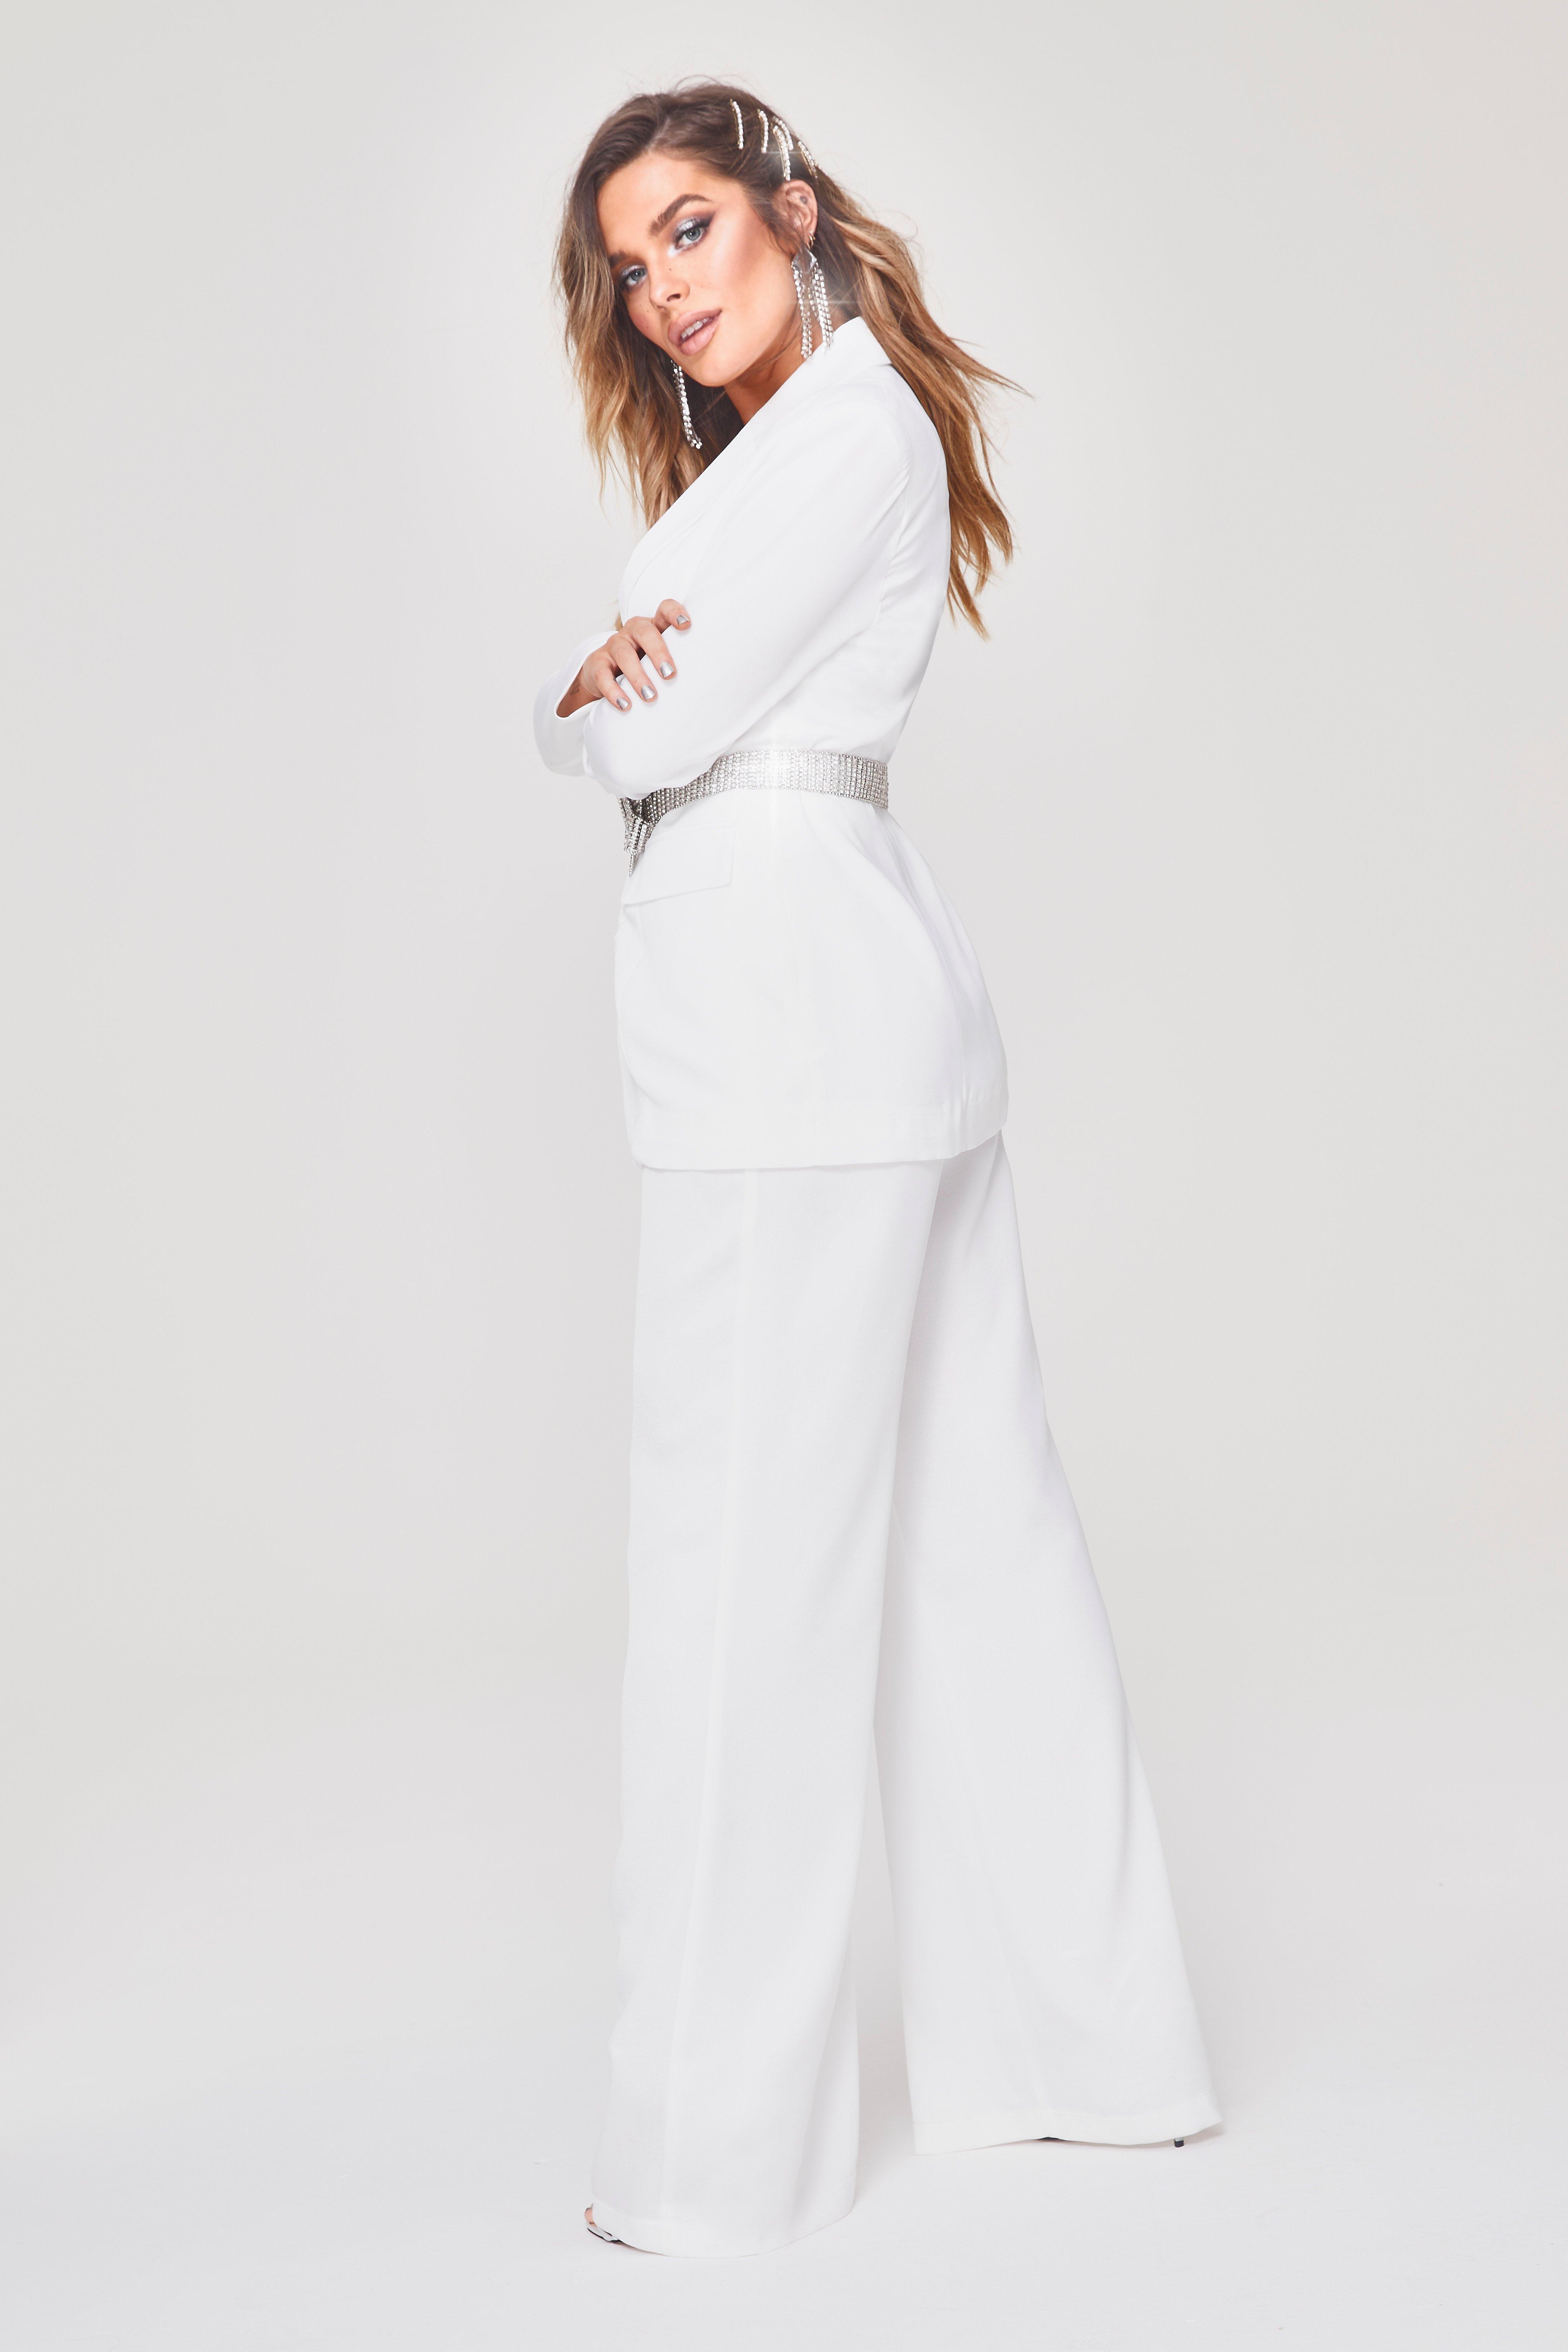 60cb39fcc464 Boohoo - White Premium Tailored Wide Leg Trouser - Lyst. View fullscreen